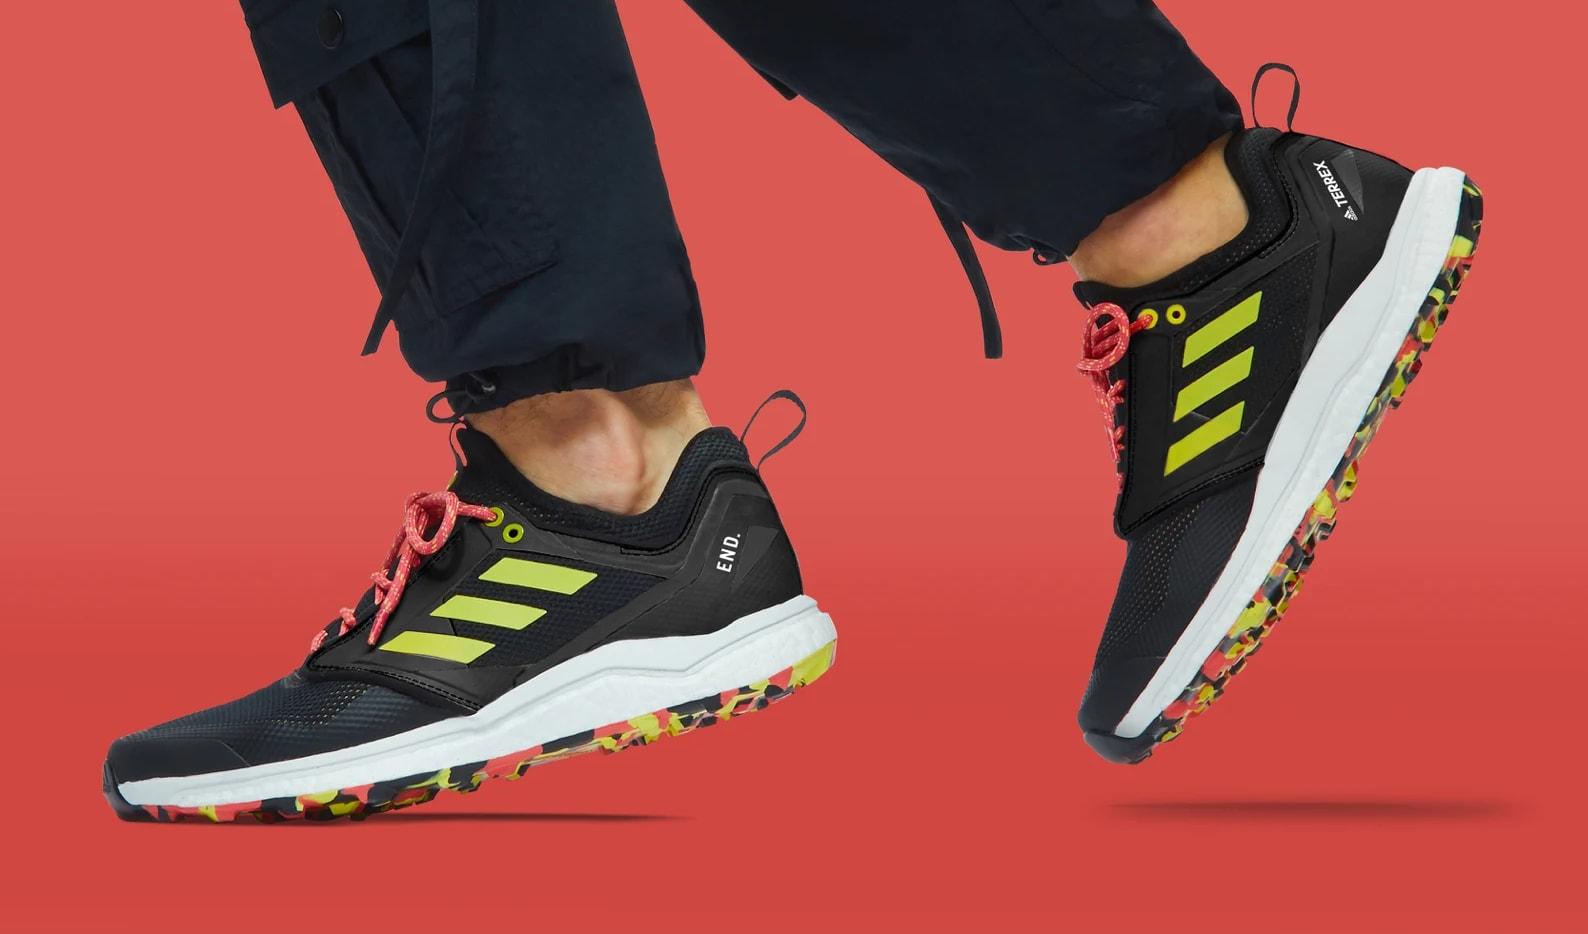 End. x Adidas Consortium Terrex Agravic XT 'Black/Red' F35785 4